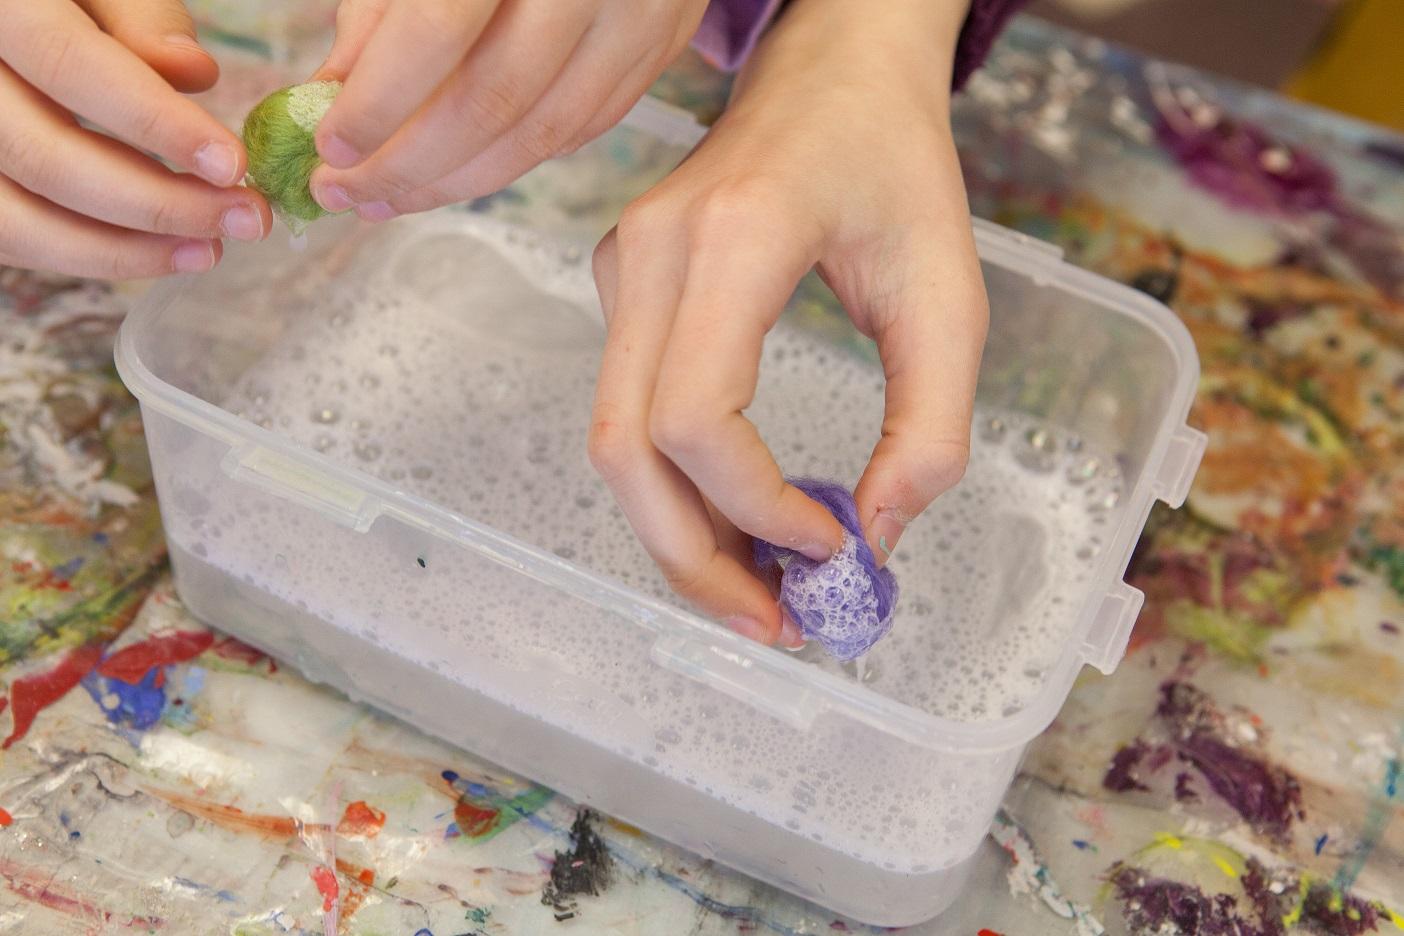 Kids hands in soap